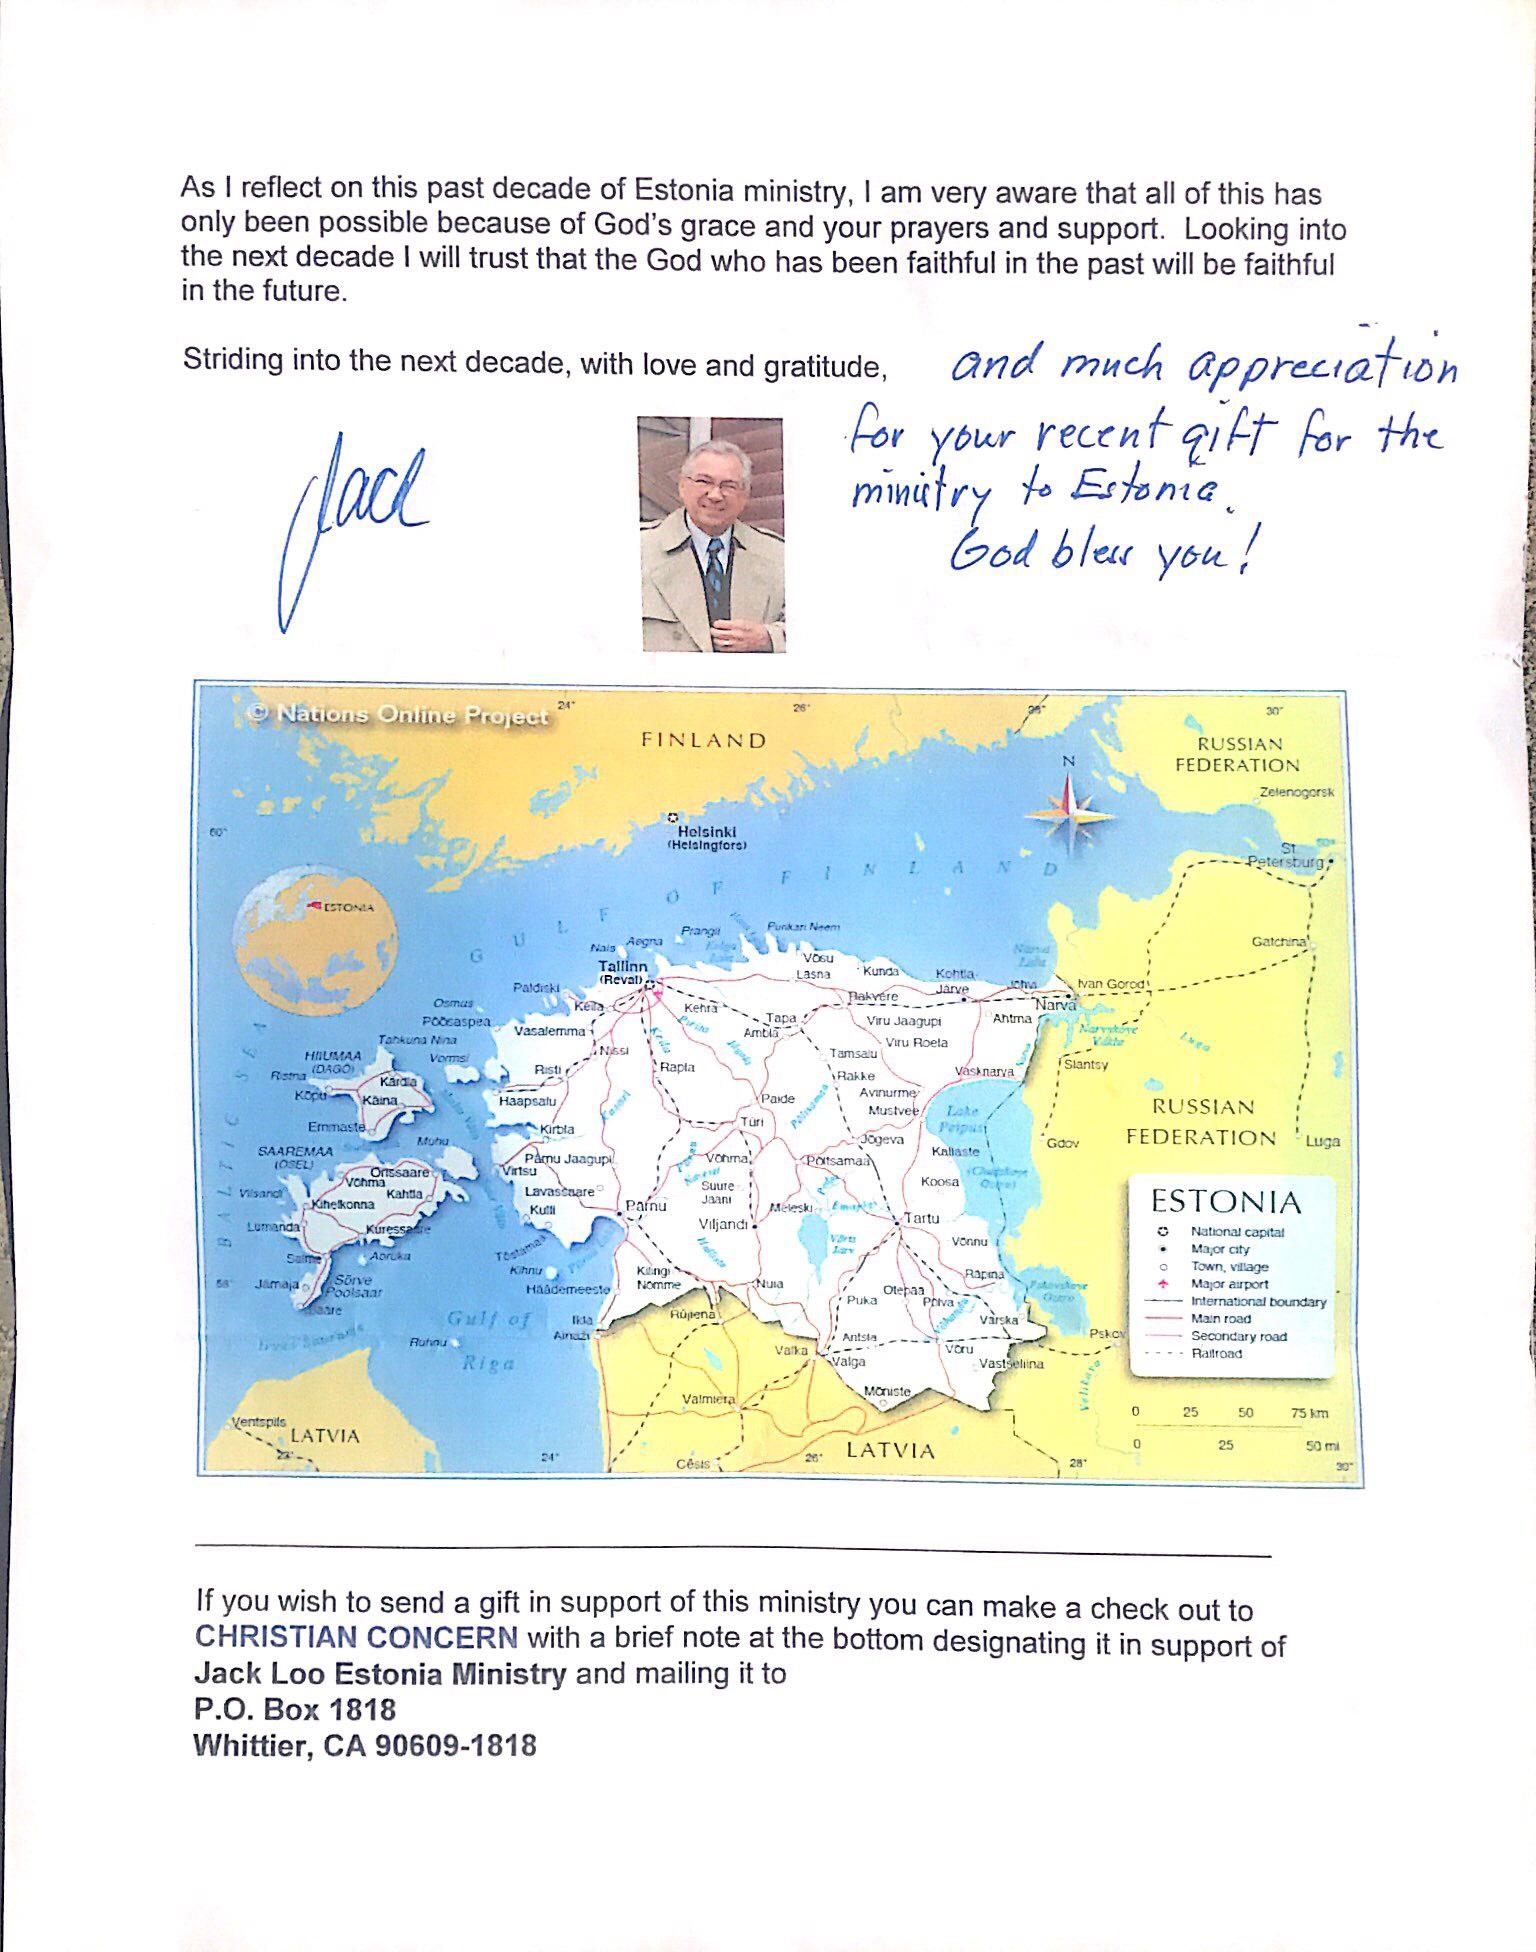 2017-03-20 Jack Loo_선교편지 5.JPG